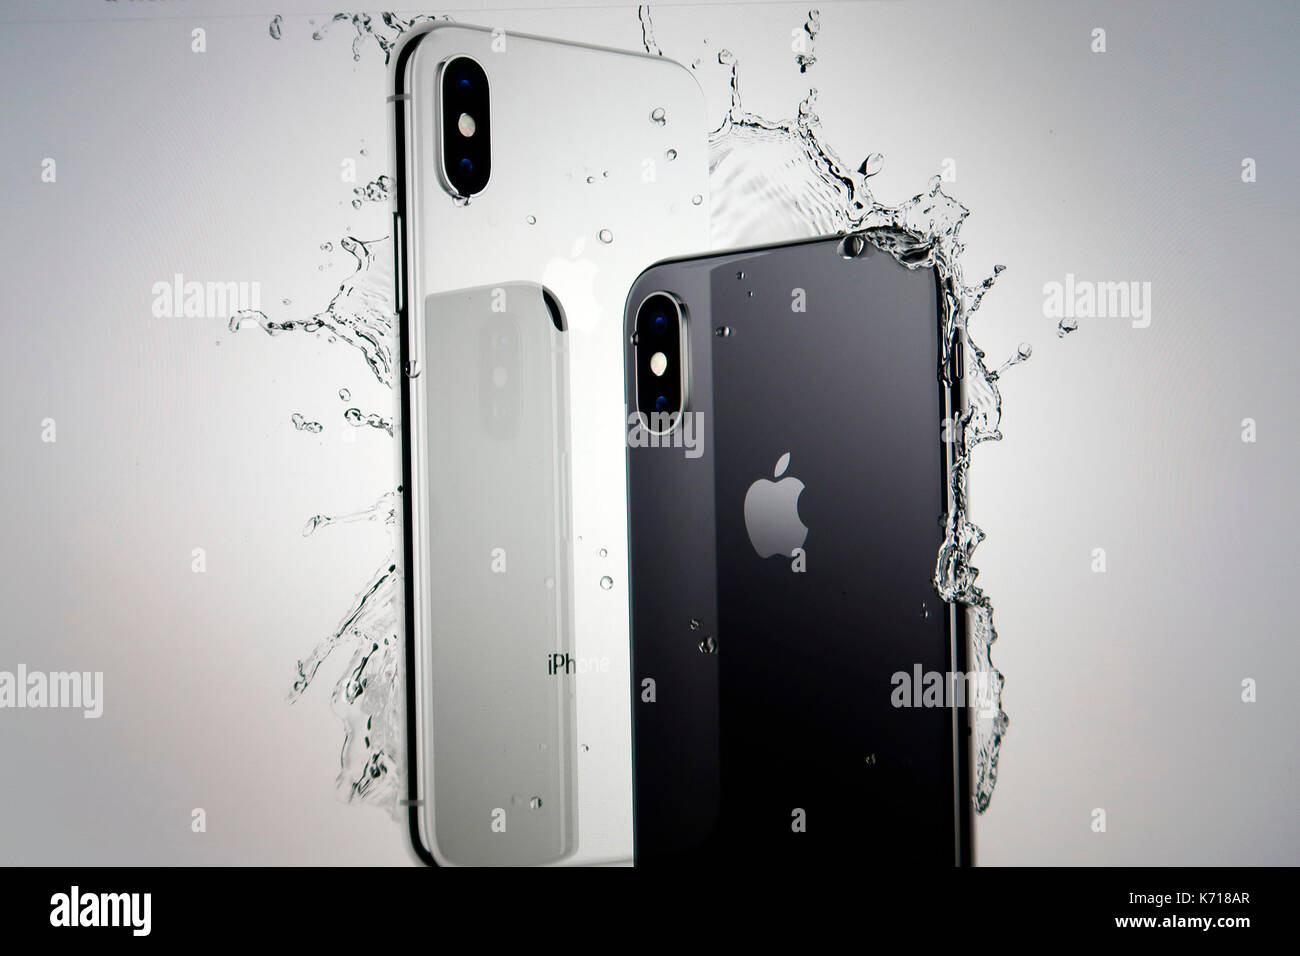 Apple iPhone X - Stock Image